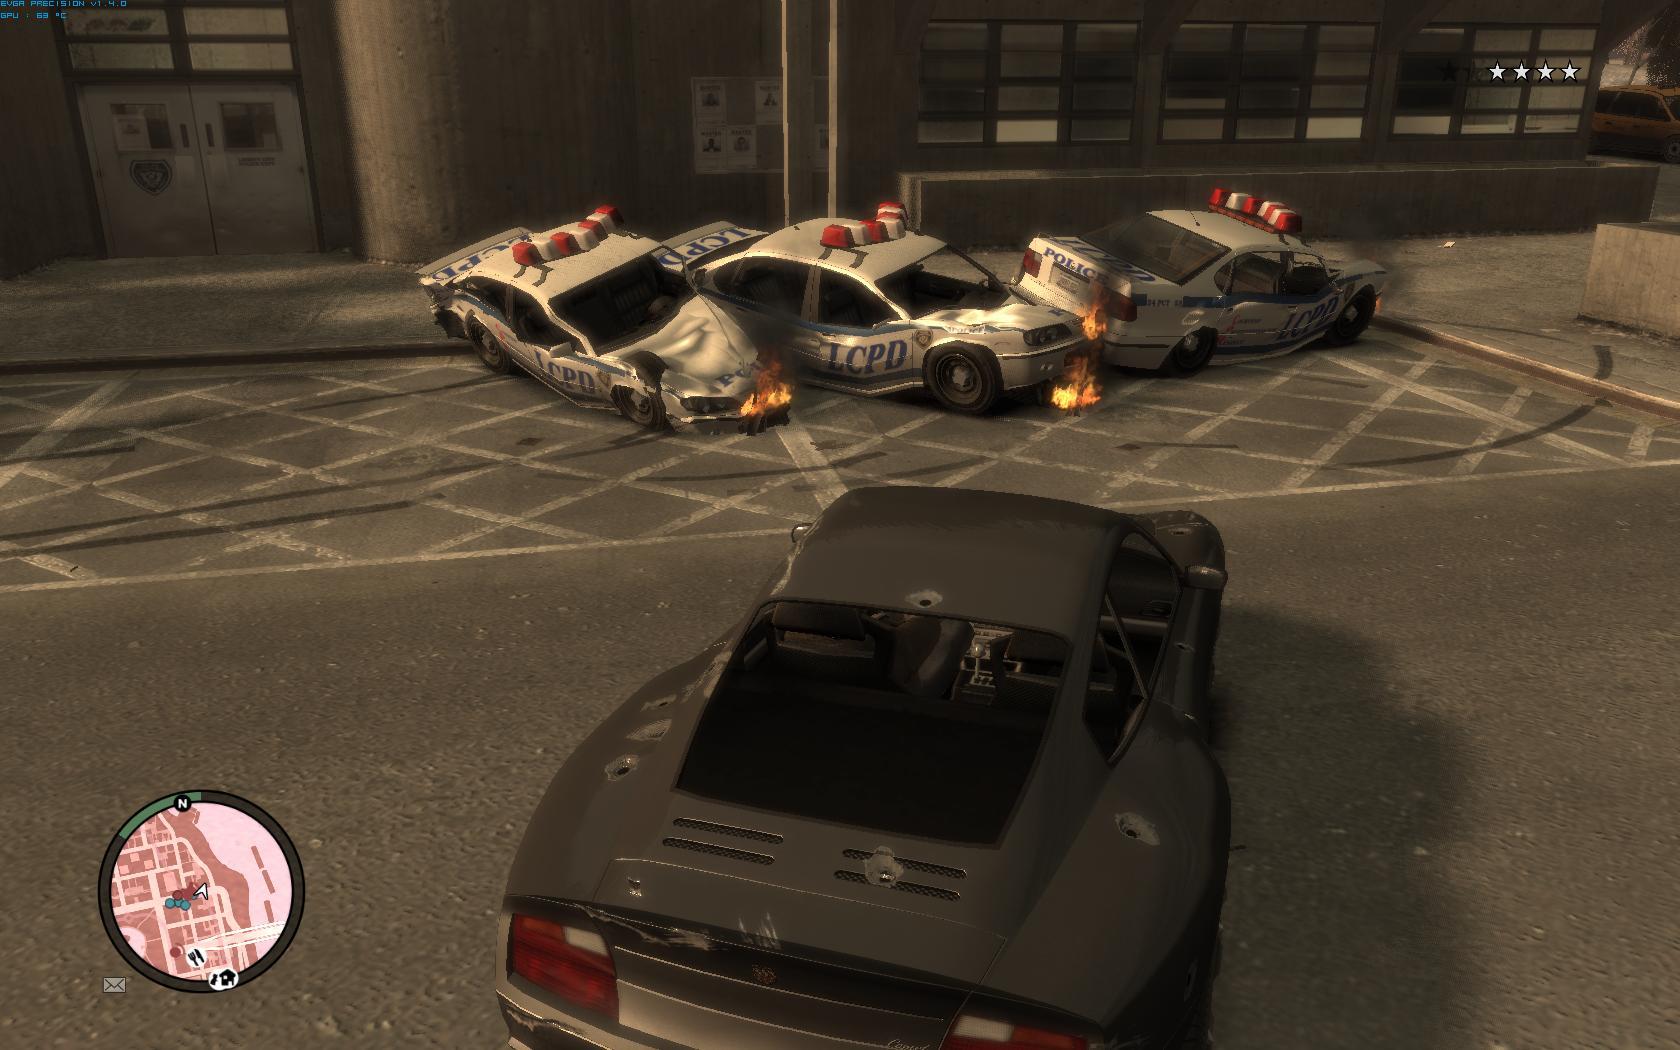 The GTA Place - GTA IV Killer Cars Mod